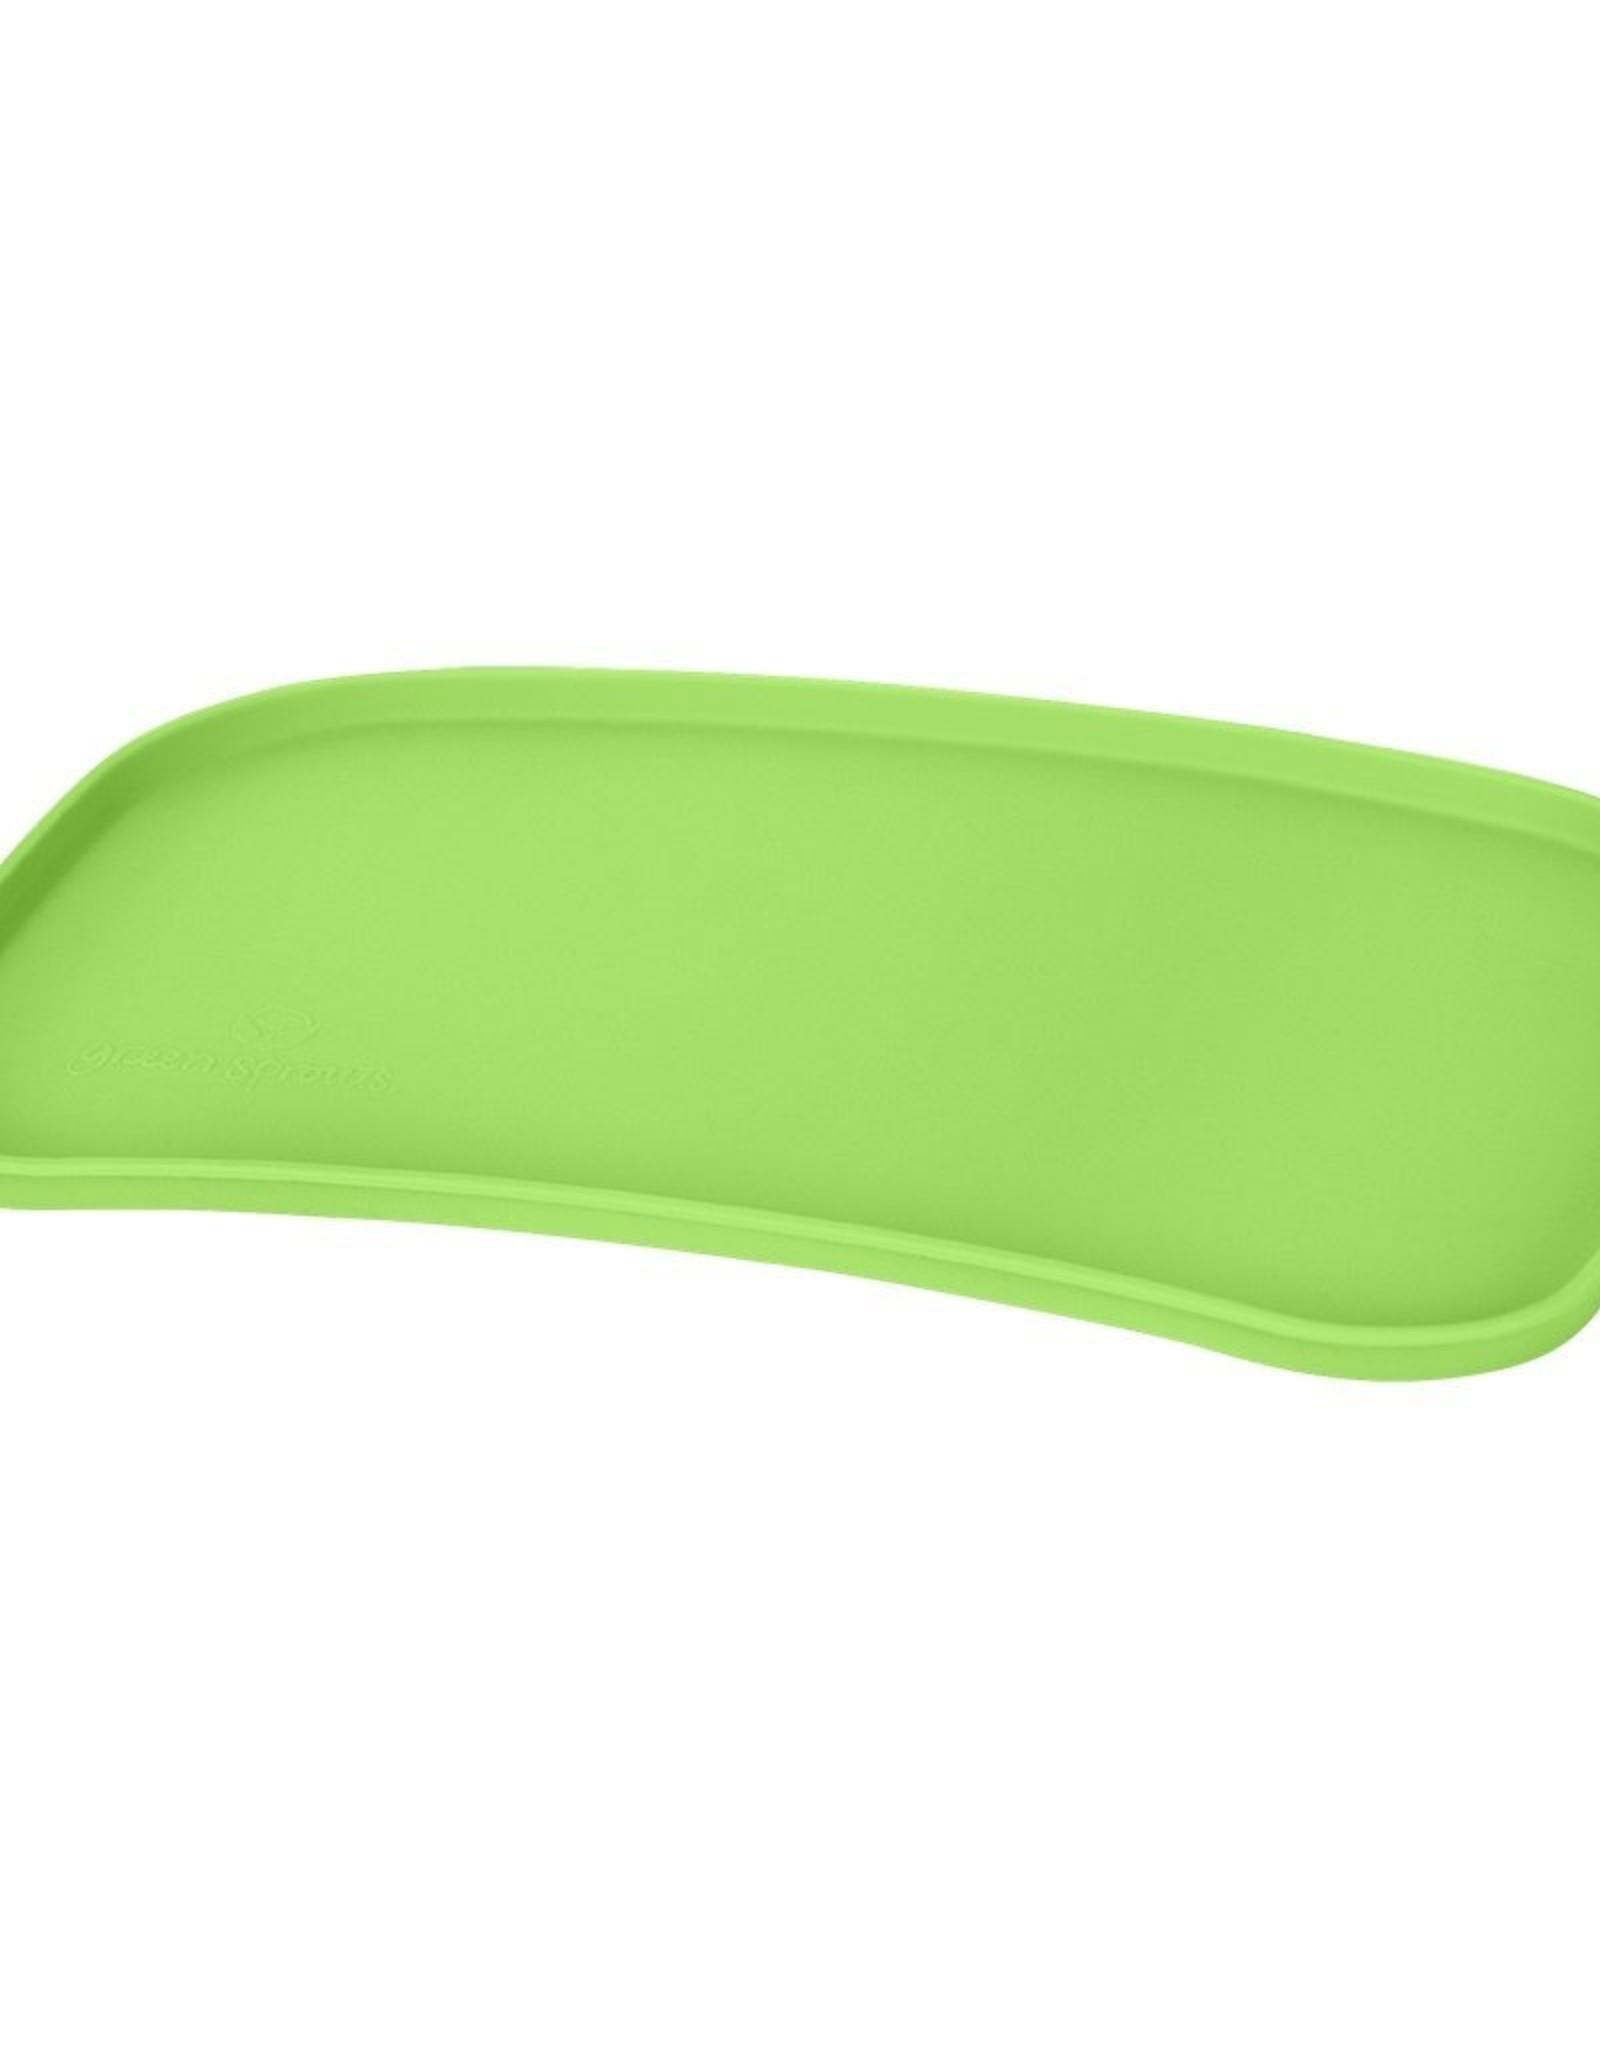 Green Sprouts Mini Silicone Platemat